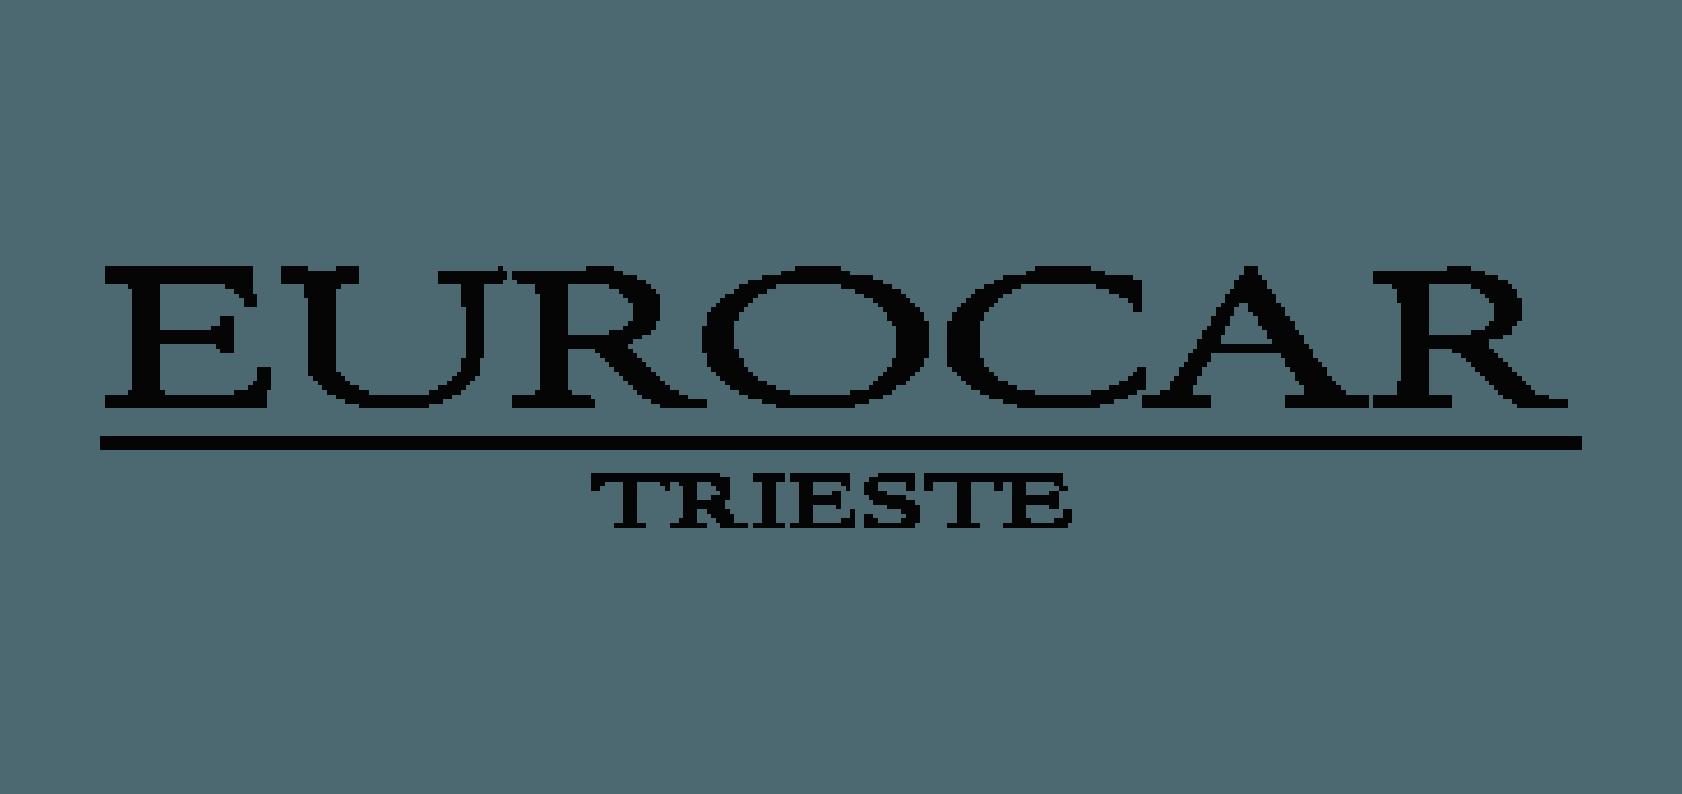 19 - eurocar